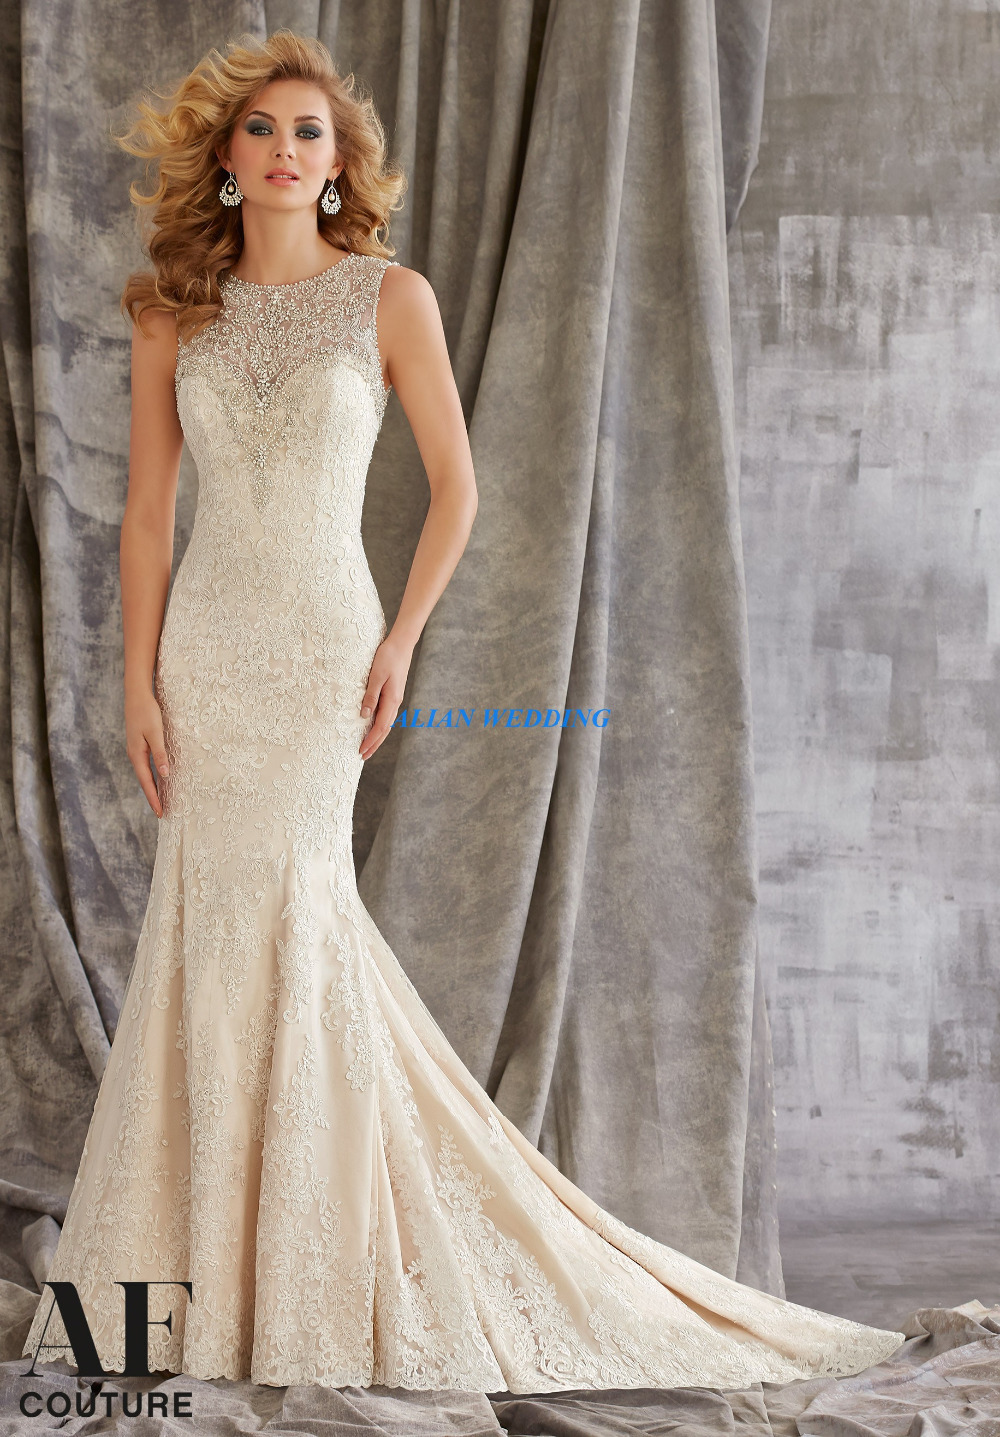 s style wedding dresses london 50s style wedding dresses Prom Style Bridesmaid Dresses Uk Ocodea